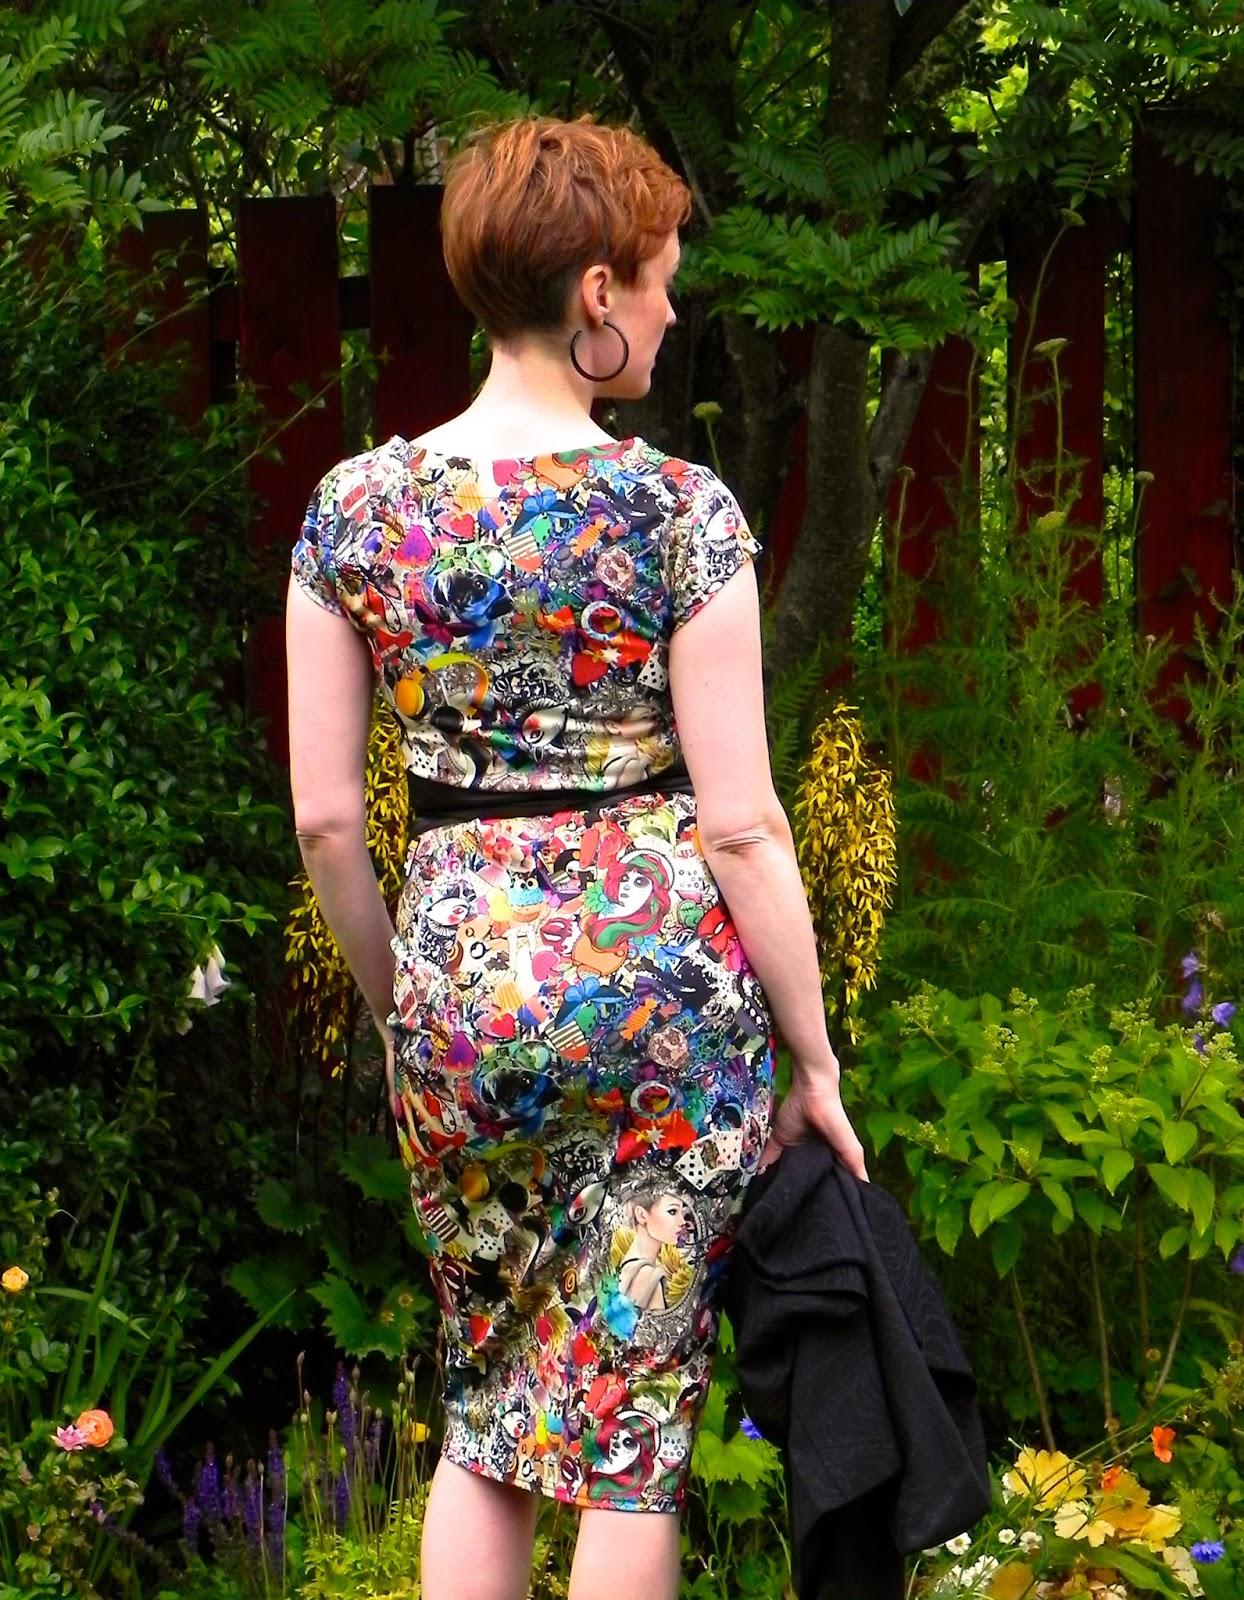 Patterned dress, vintage kimono, black leather obi belt. Back view